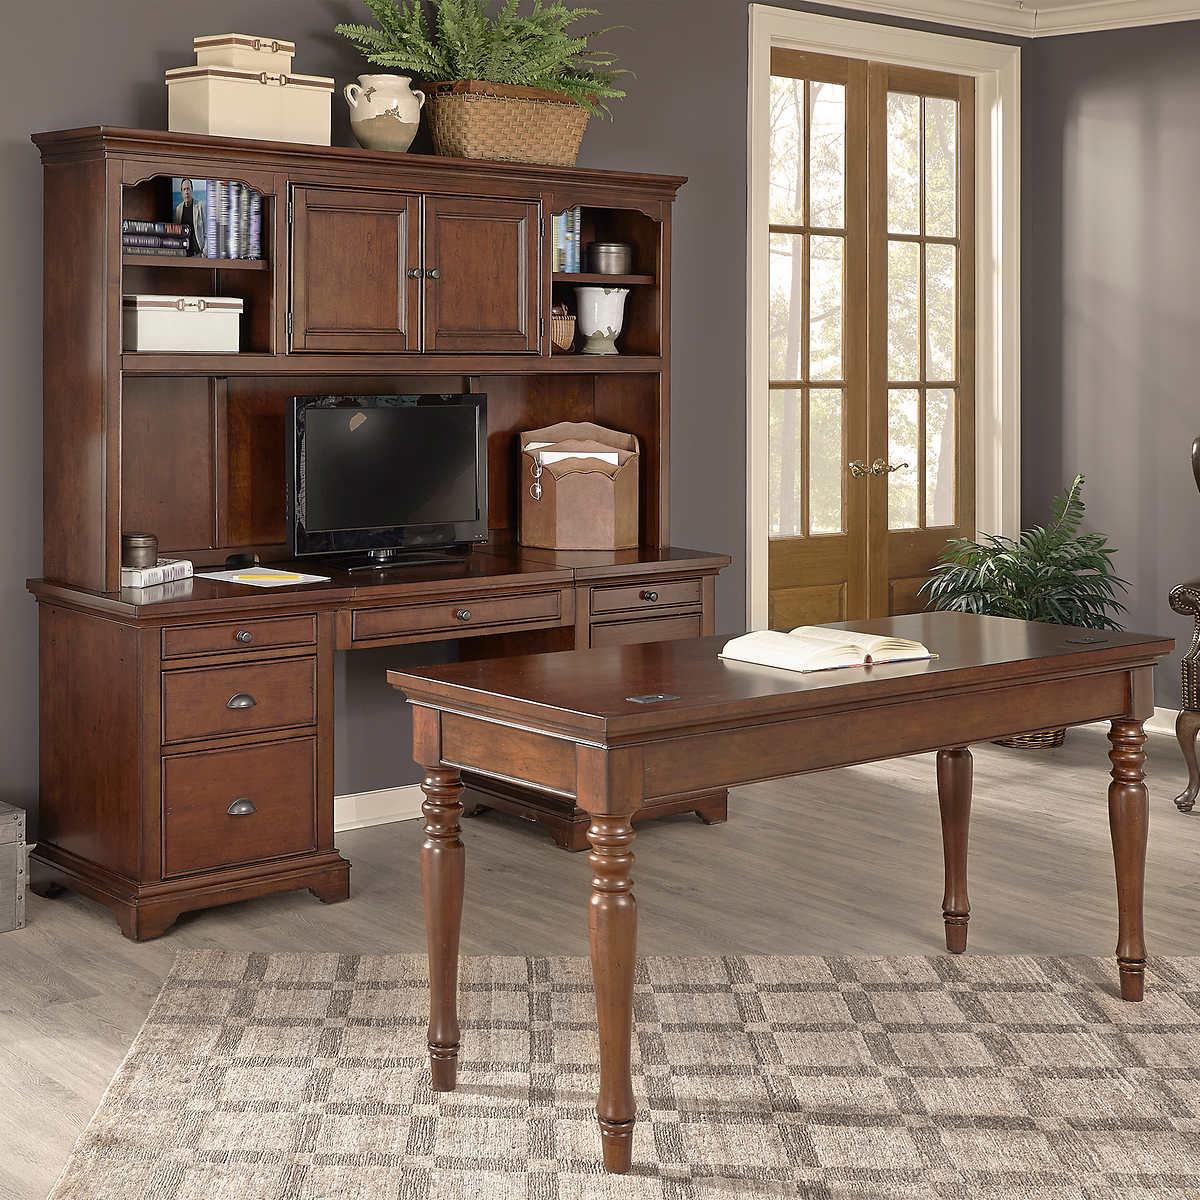 Images Of Desks student desks | costco